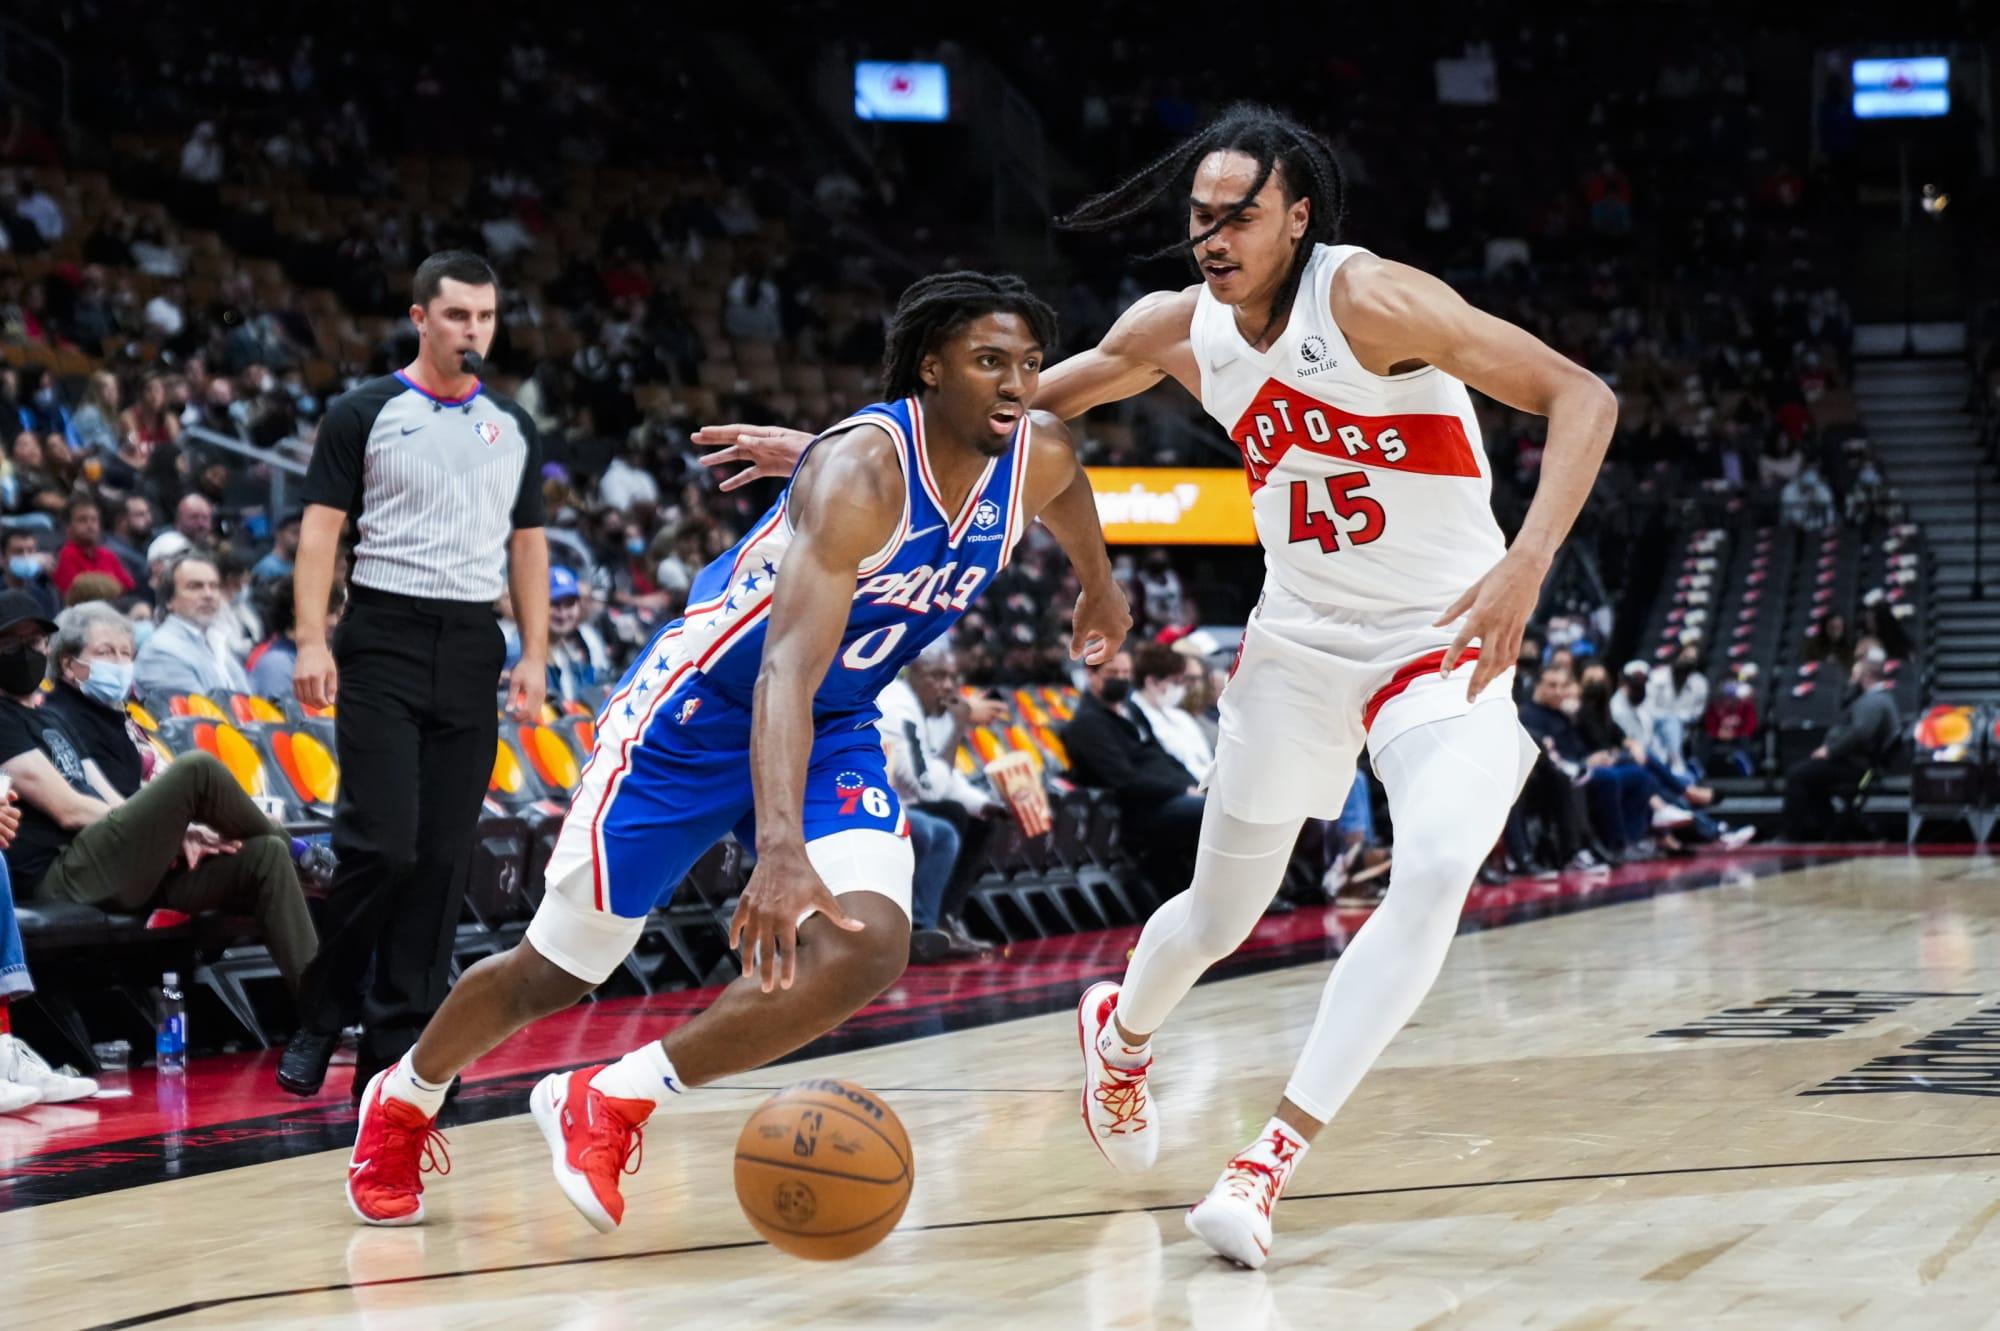 Toronto Raptors: Nick Nurse hints two rookies could make rotation